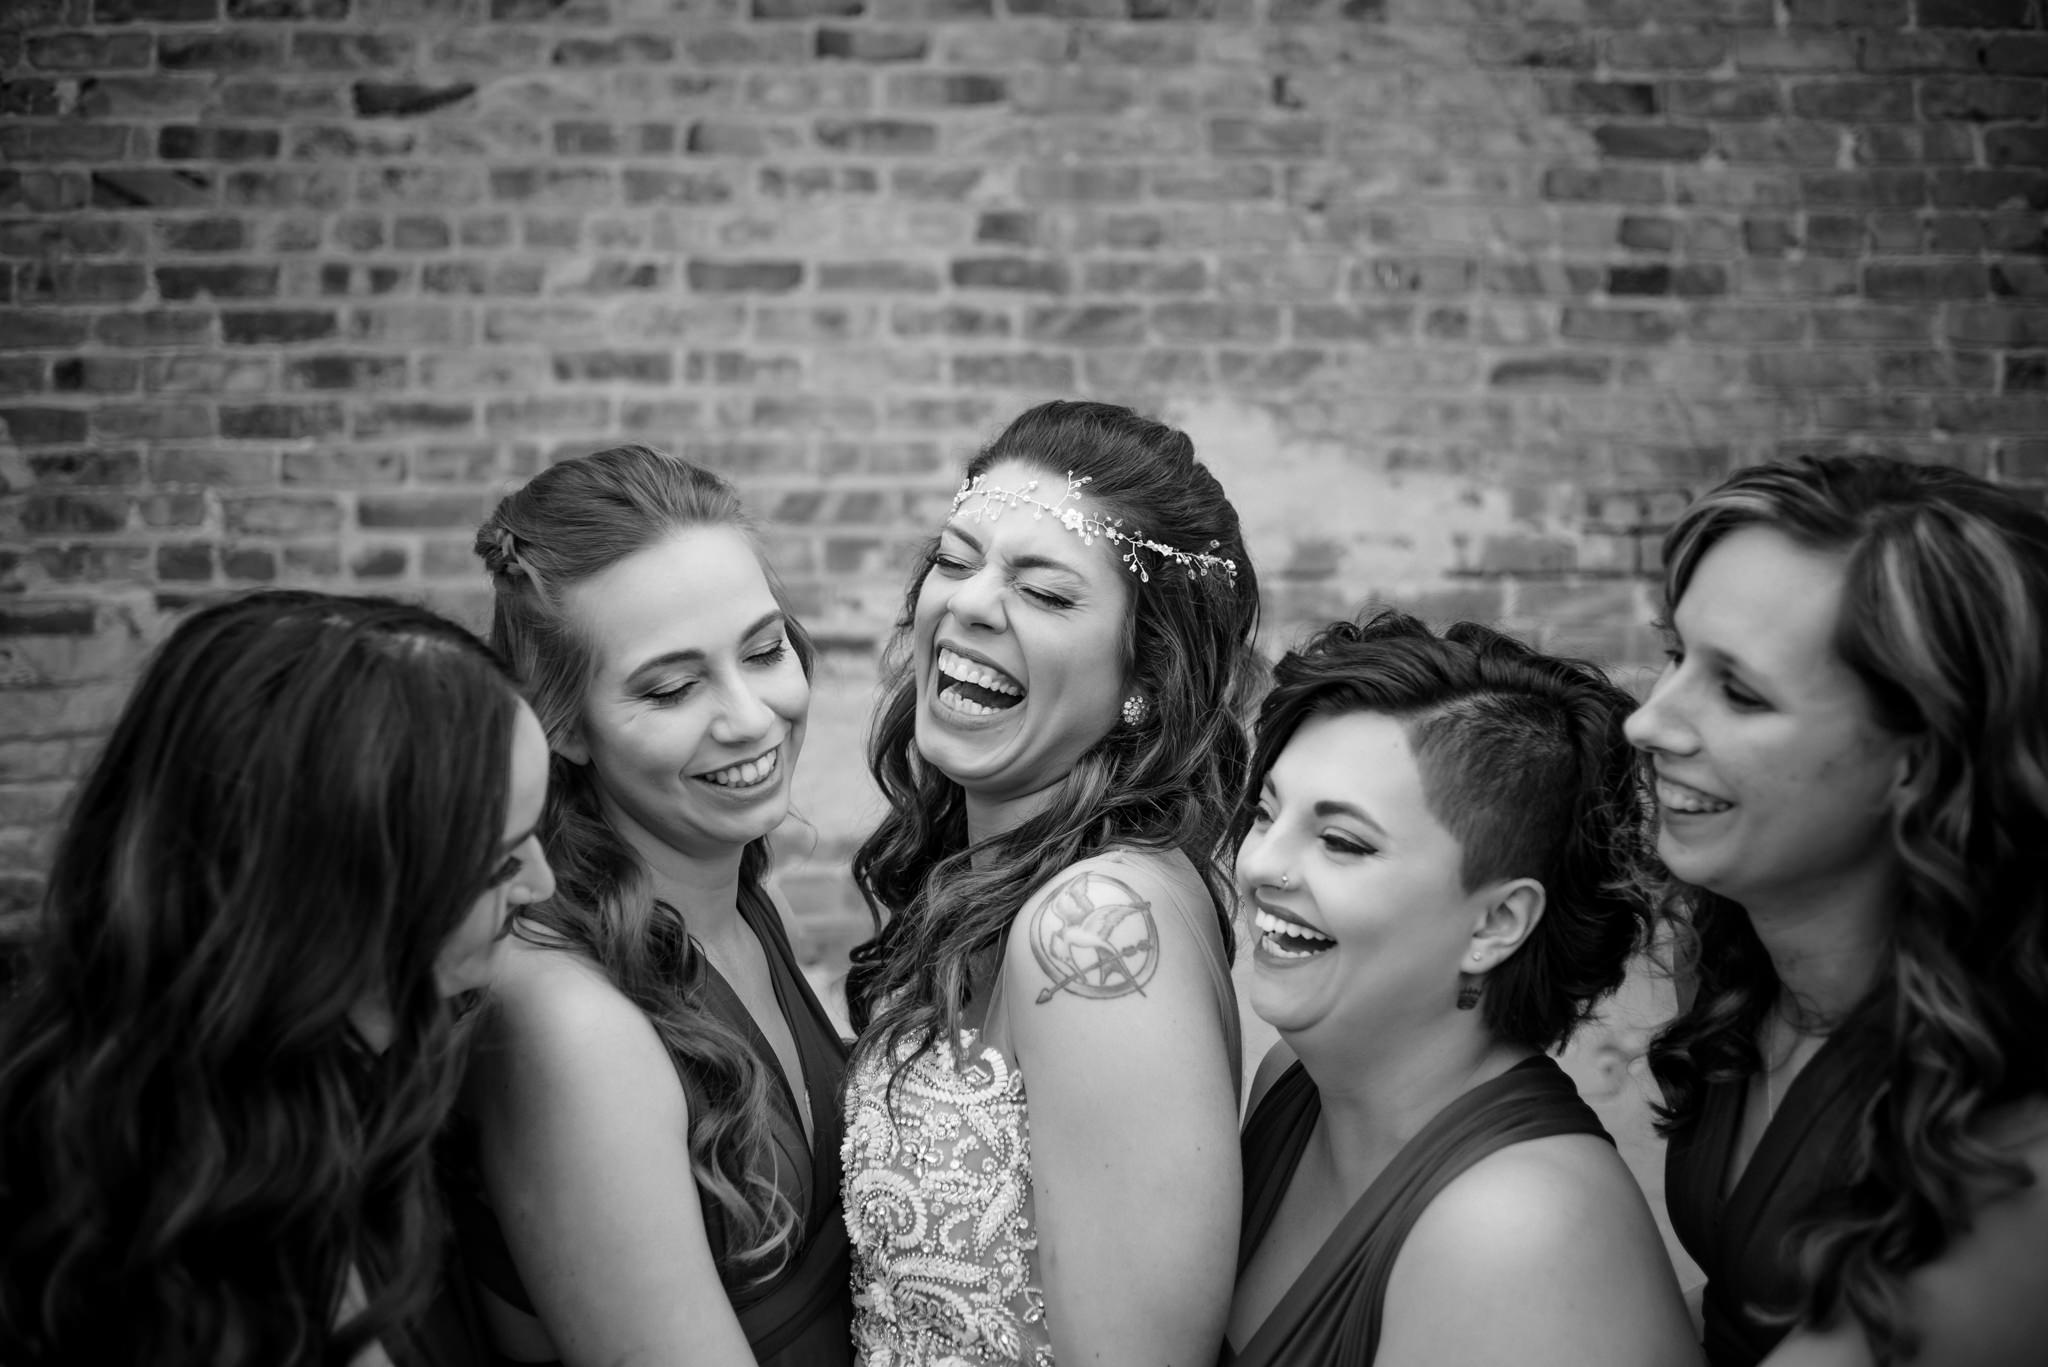 HILTON-OMAHA-WEDDING-PHOTOGRAPHER-JM-STUDIOS-OMAHA-LIV-BRICE-014.jpg